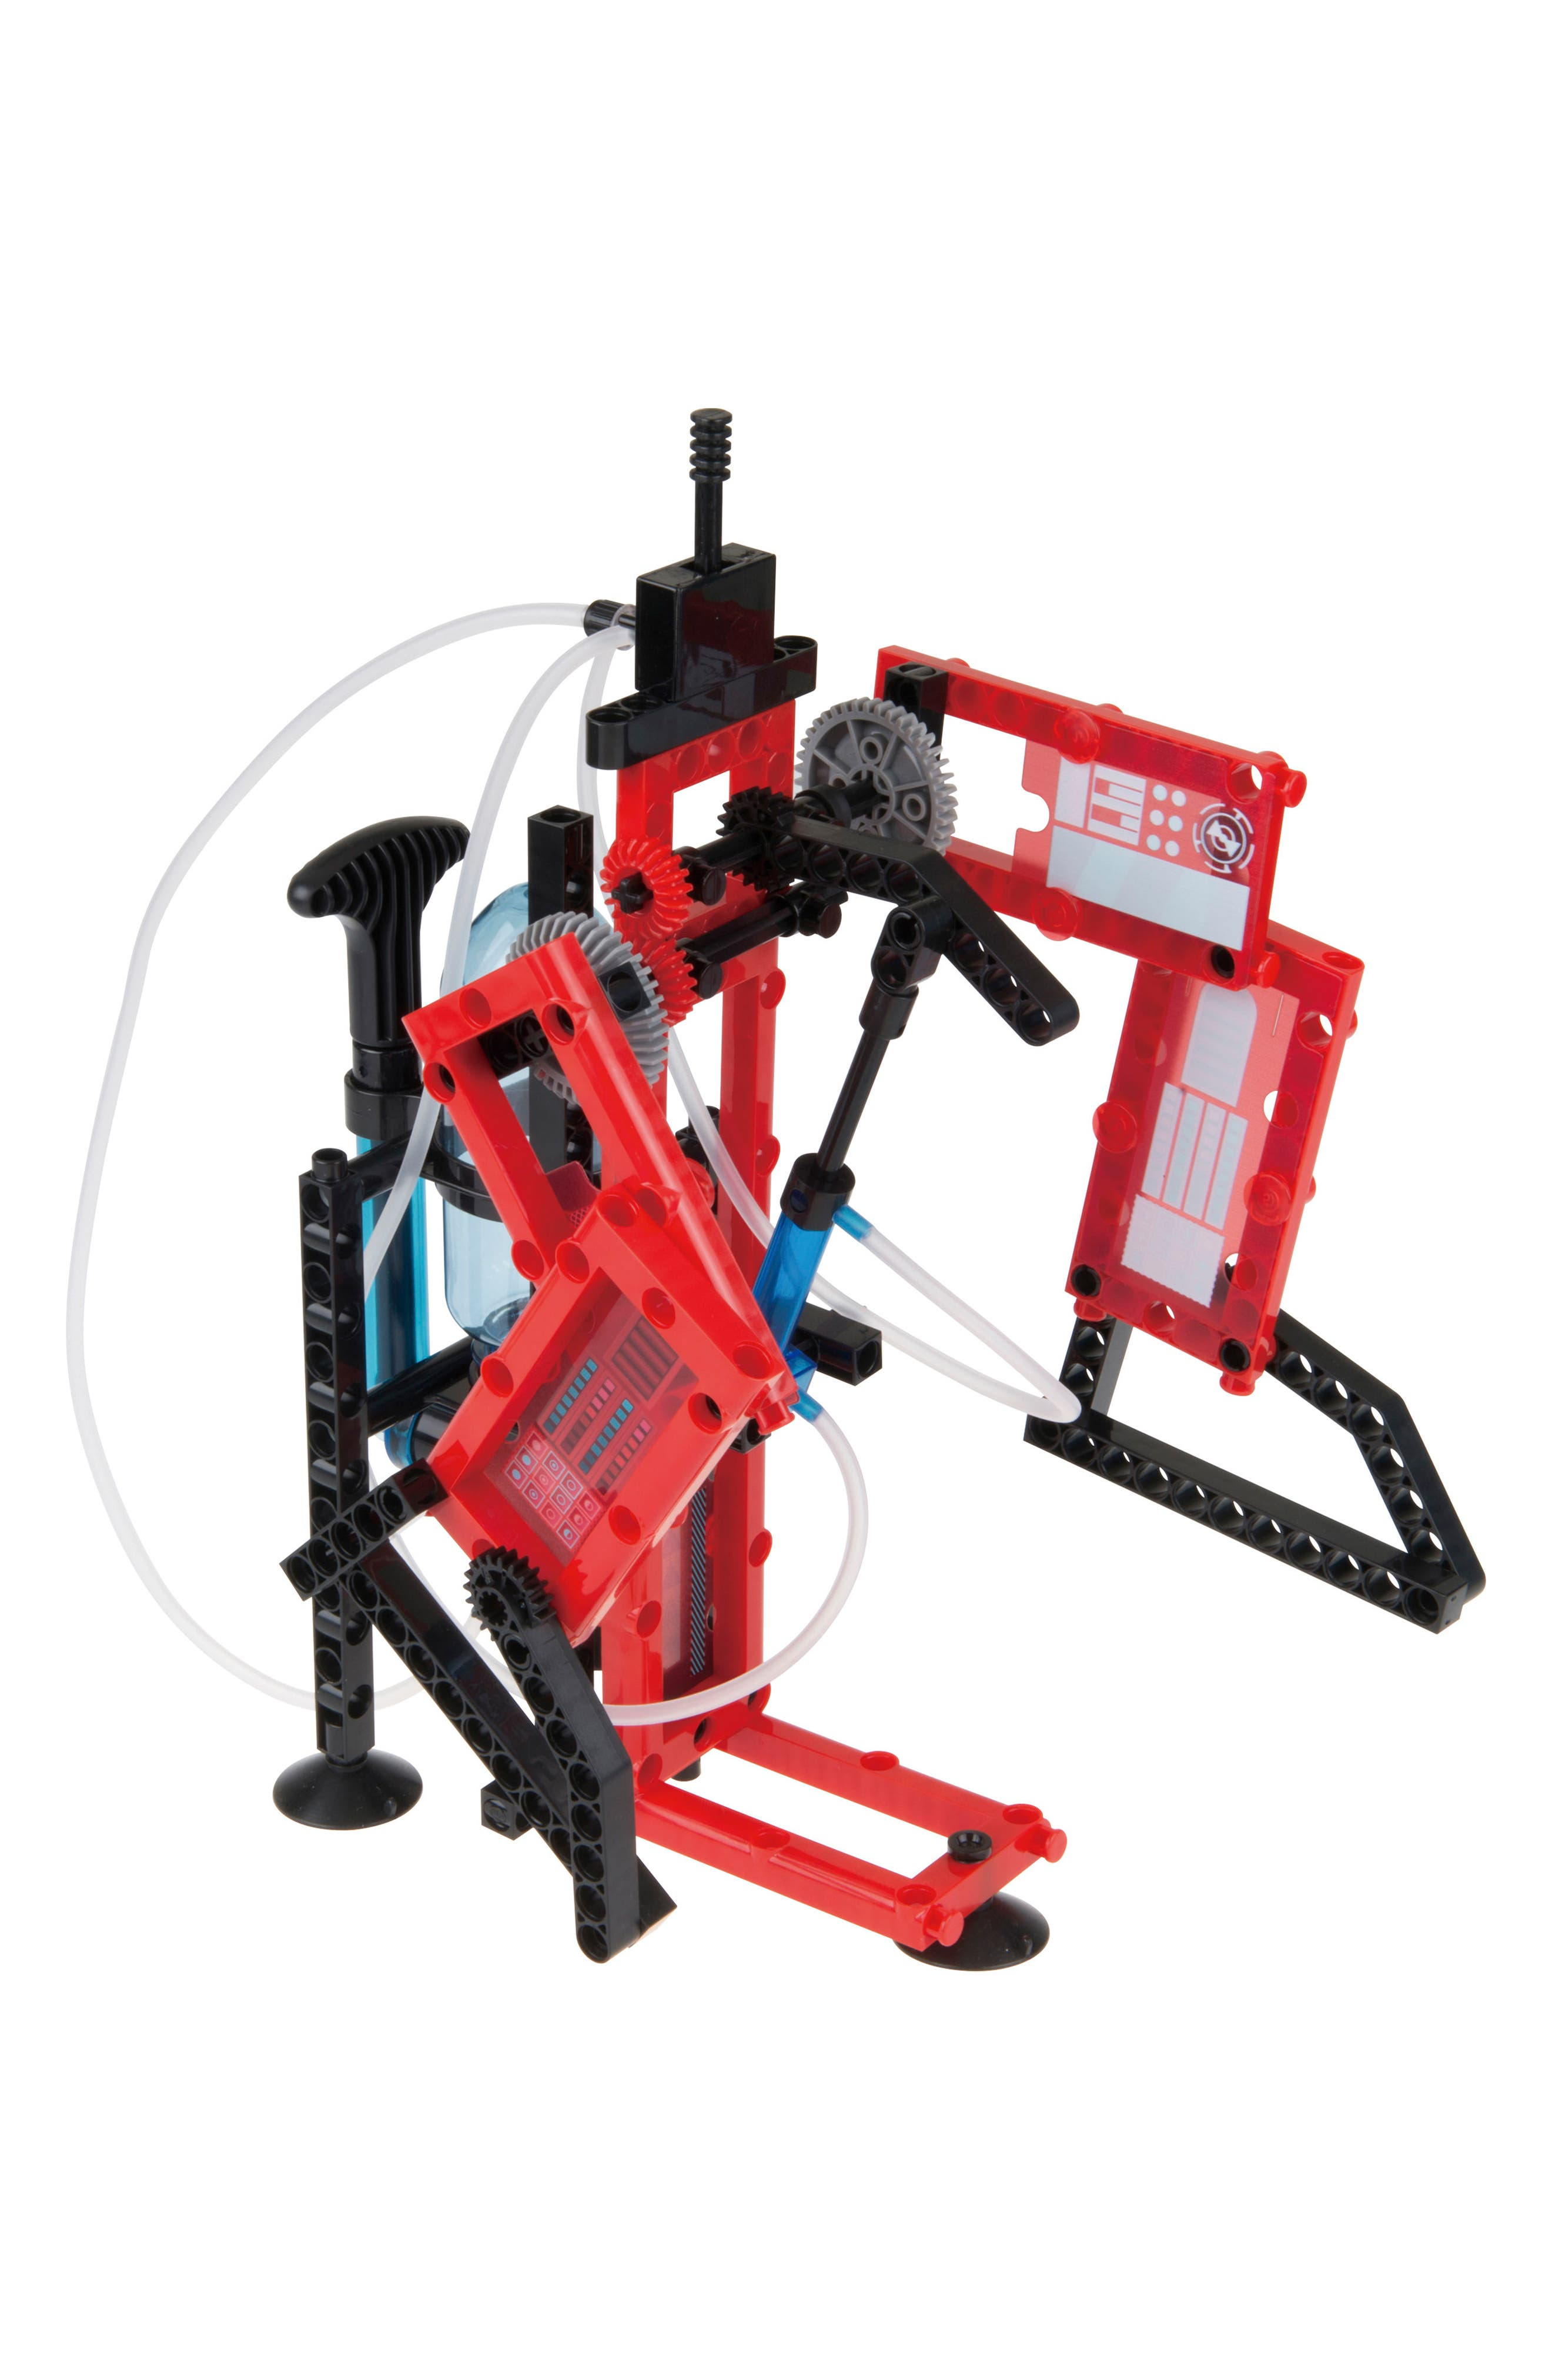 Mechanical Engineering Robotic Arms Kit,                             Alternate thumbnail 5, color,                             MULTI